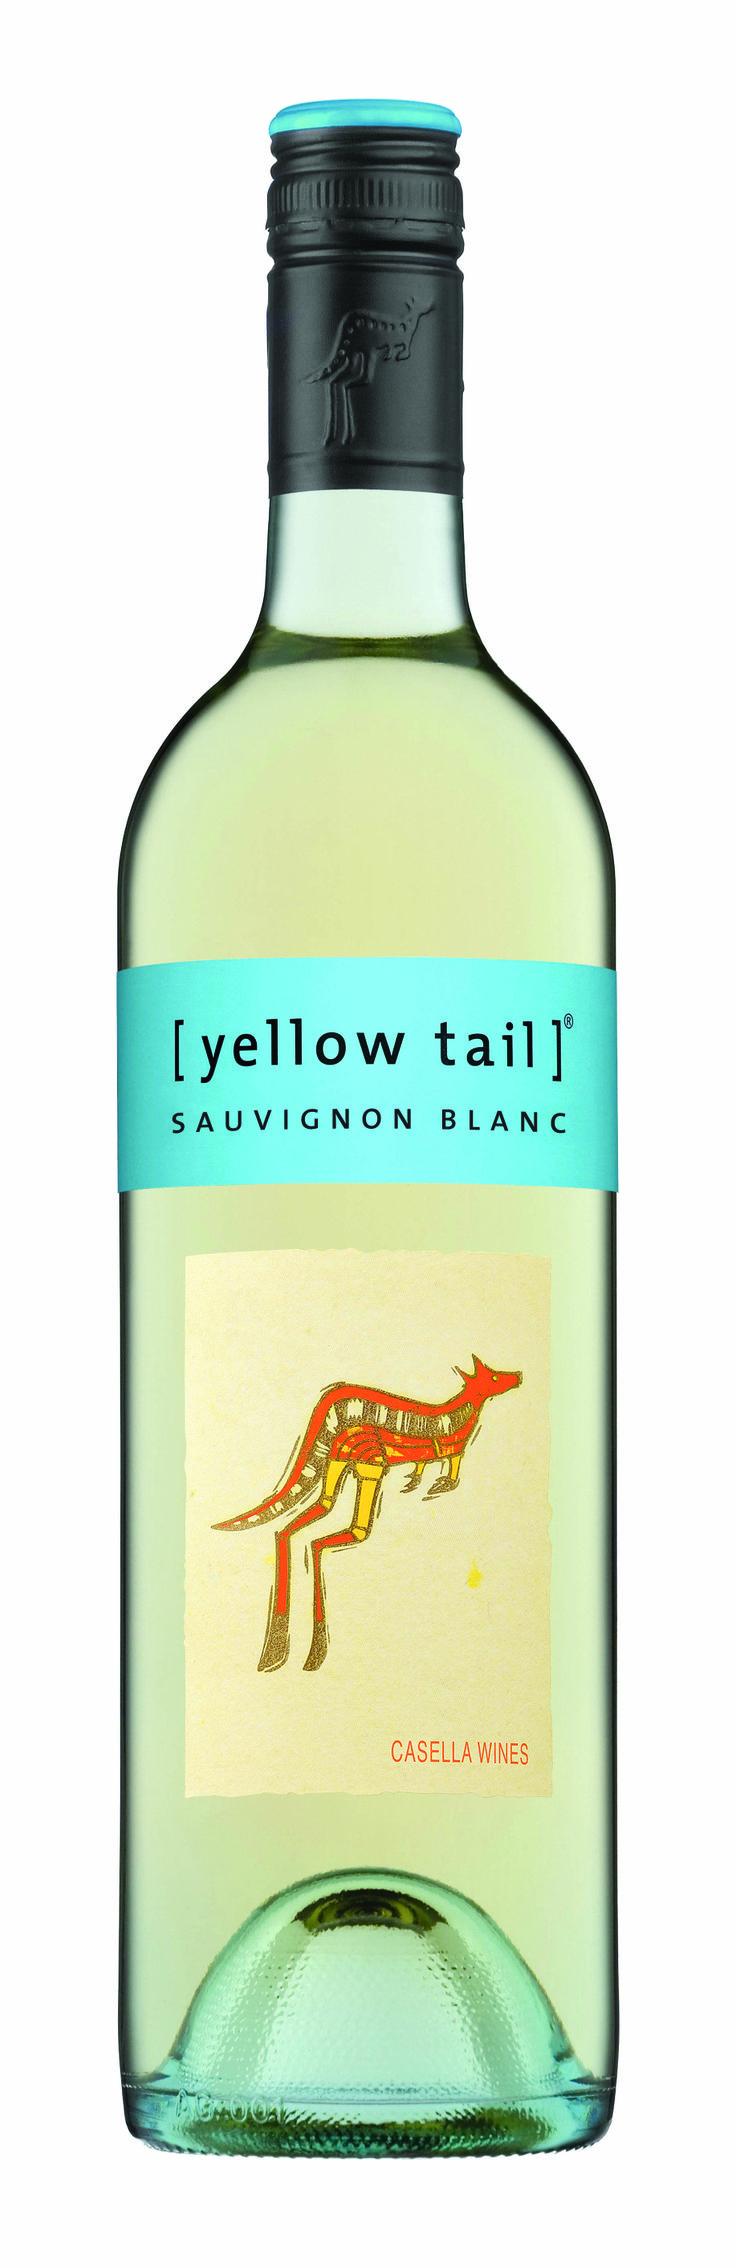 yellow tail wine - Google Search